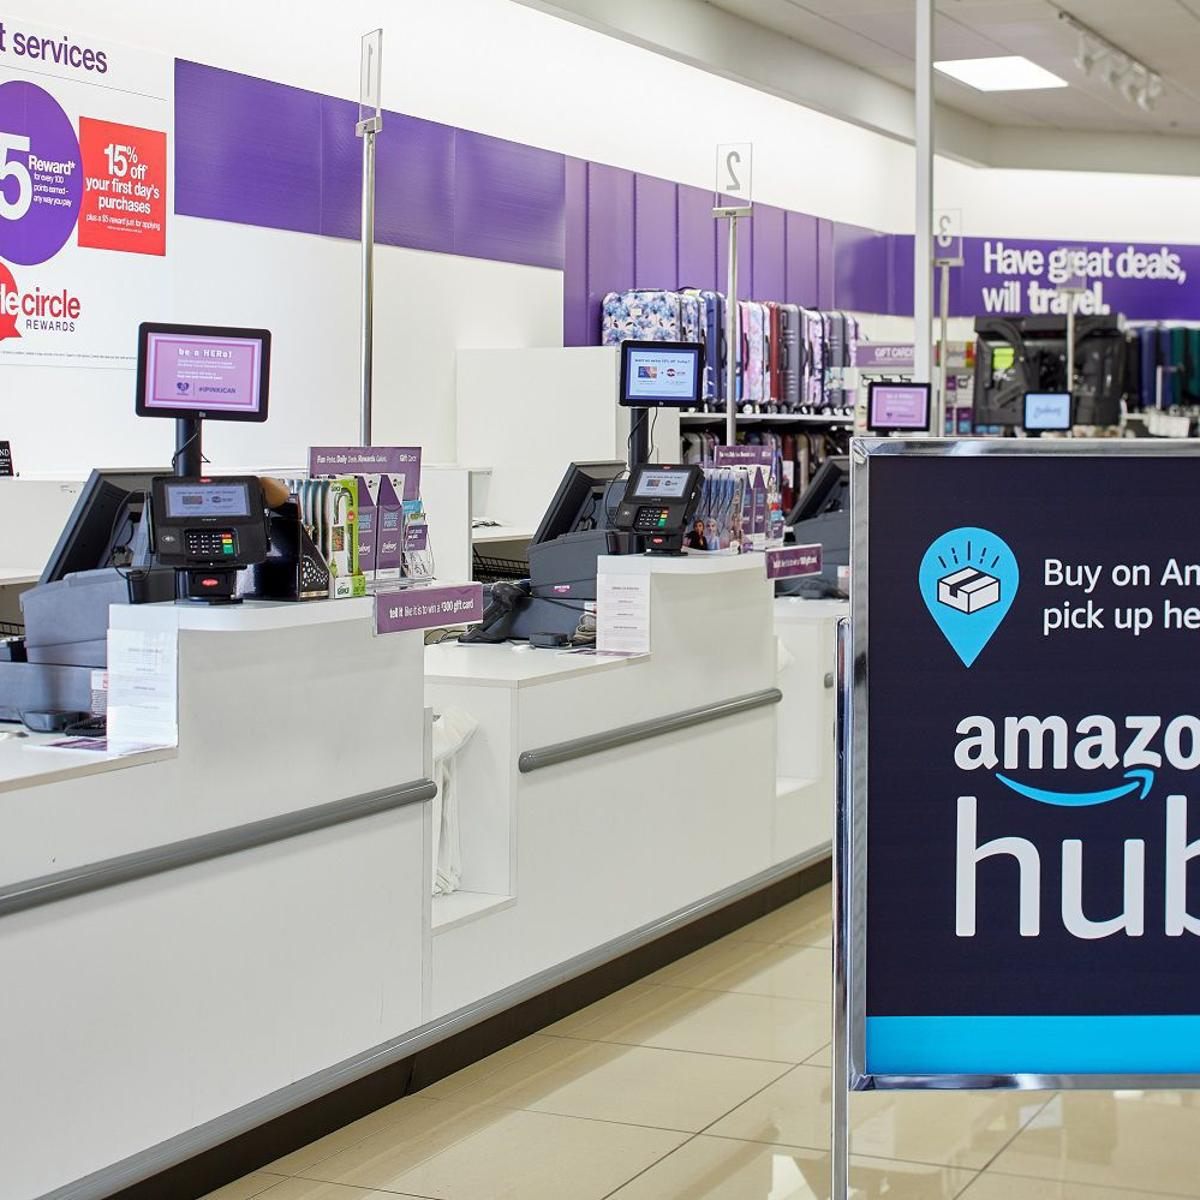 Gordmans To Offer Amazon Counter Pick Up Local Fremonttribune Com